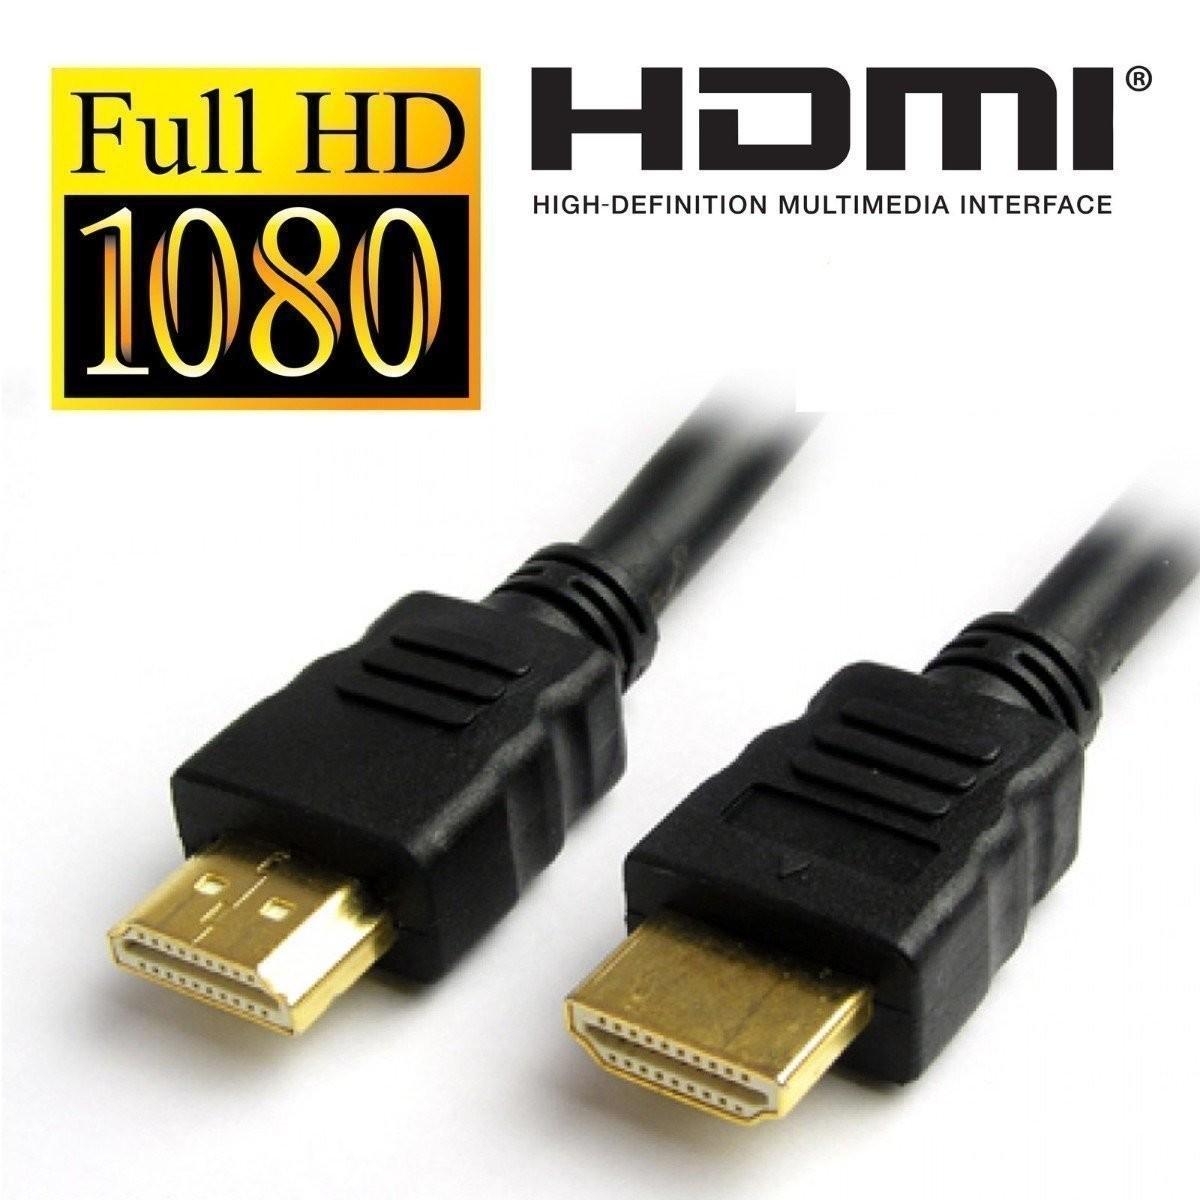 Haze 5 Meter HDMI Cable, PVC, Black